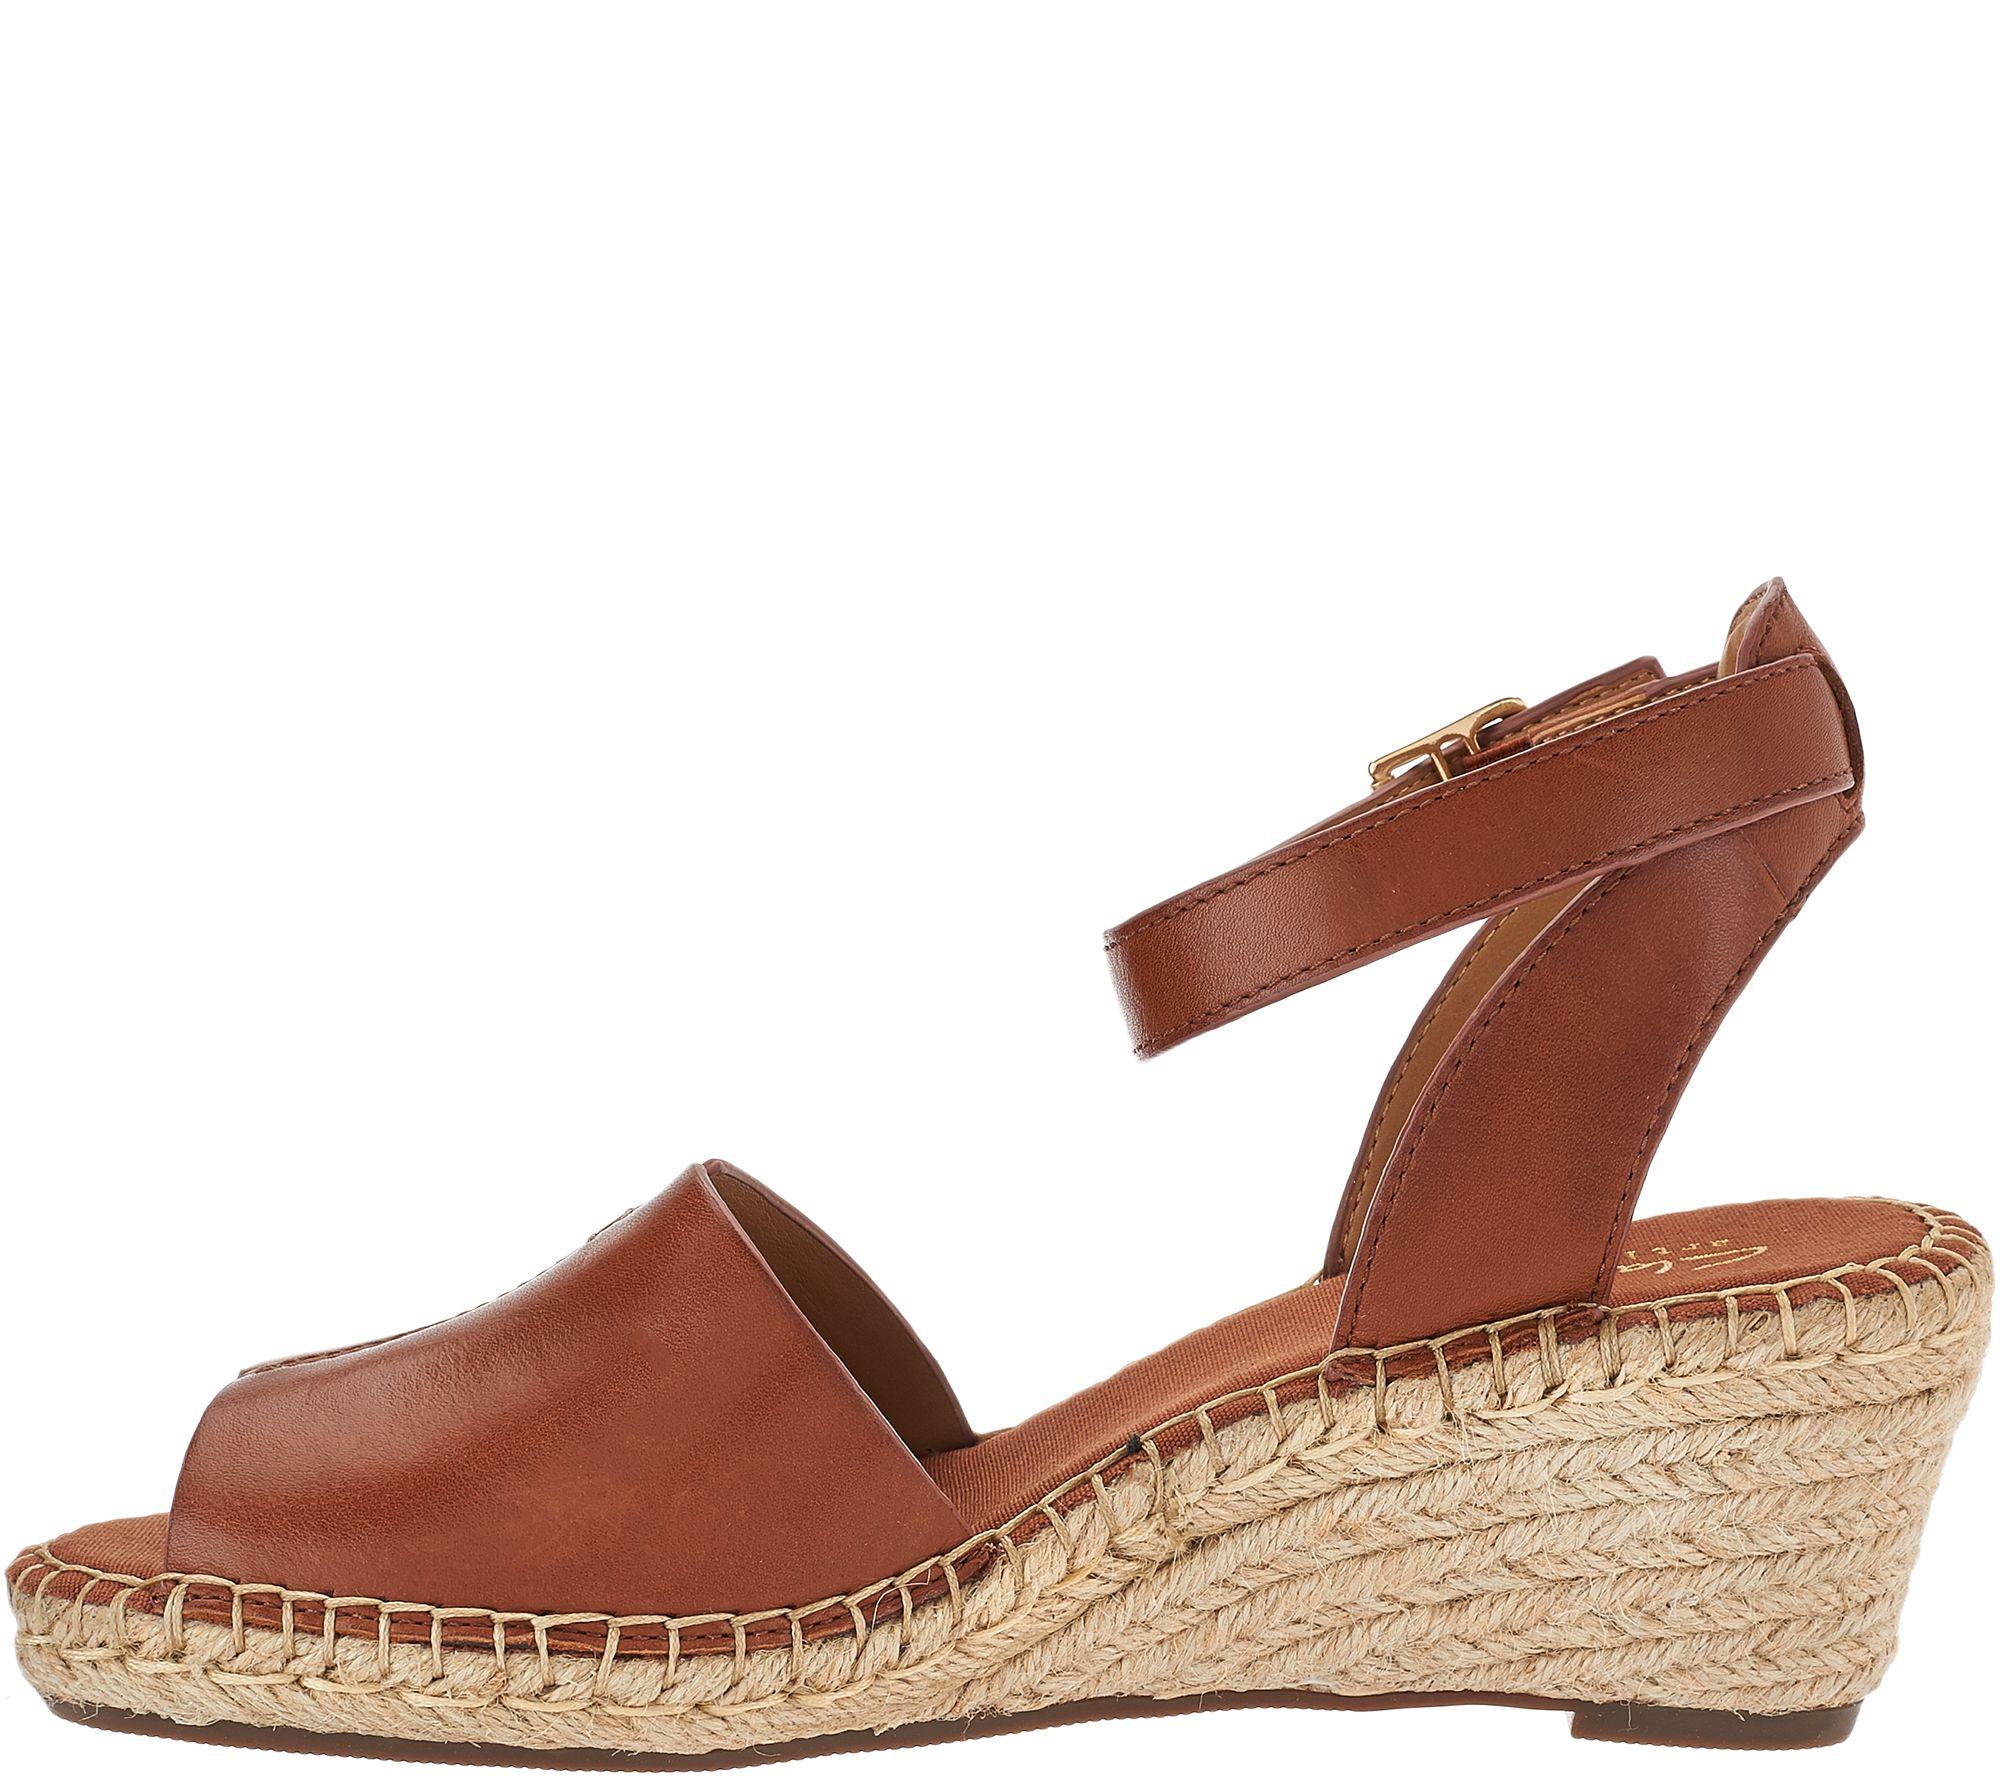 065068c4b61 Clarks Artisan Leather Espadrille Wedge Sandals - Petrina Selma - Page 1 —  QVC.com